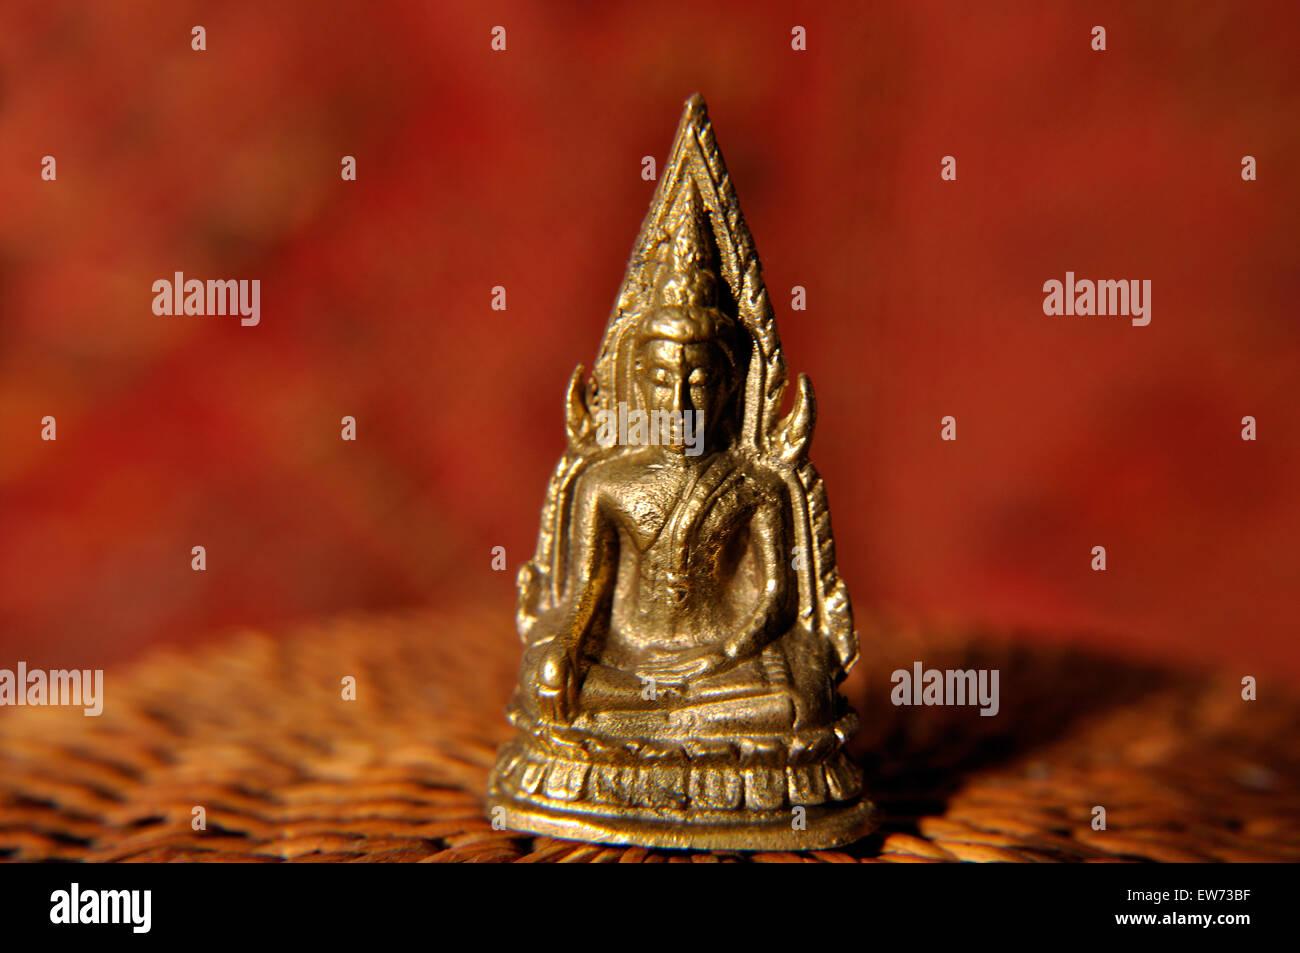 Miniature Thai Buddhist amulet in studio setting - Stock Image